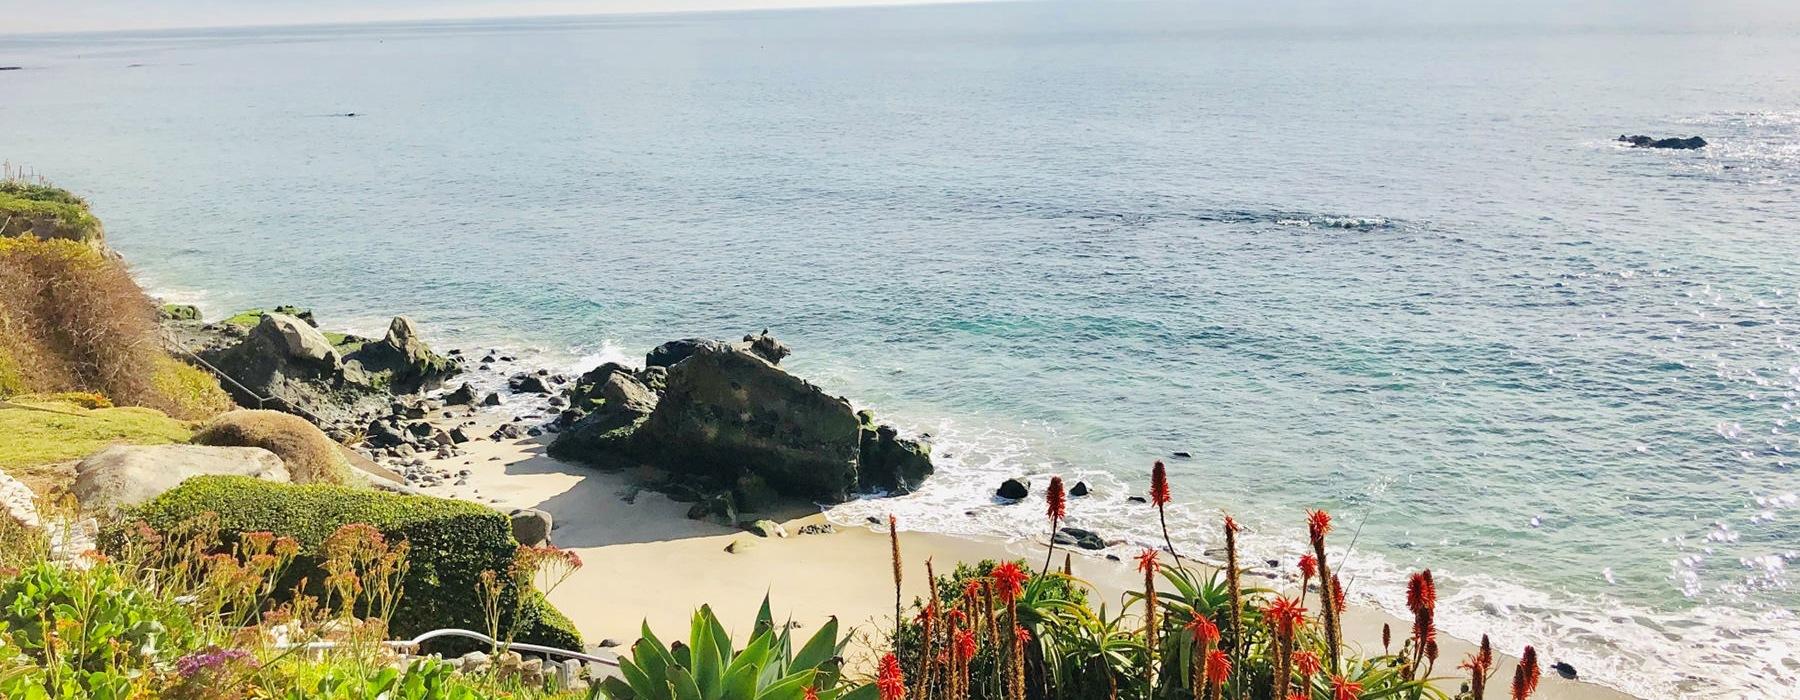 Landscape shot of laguna beach